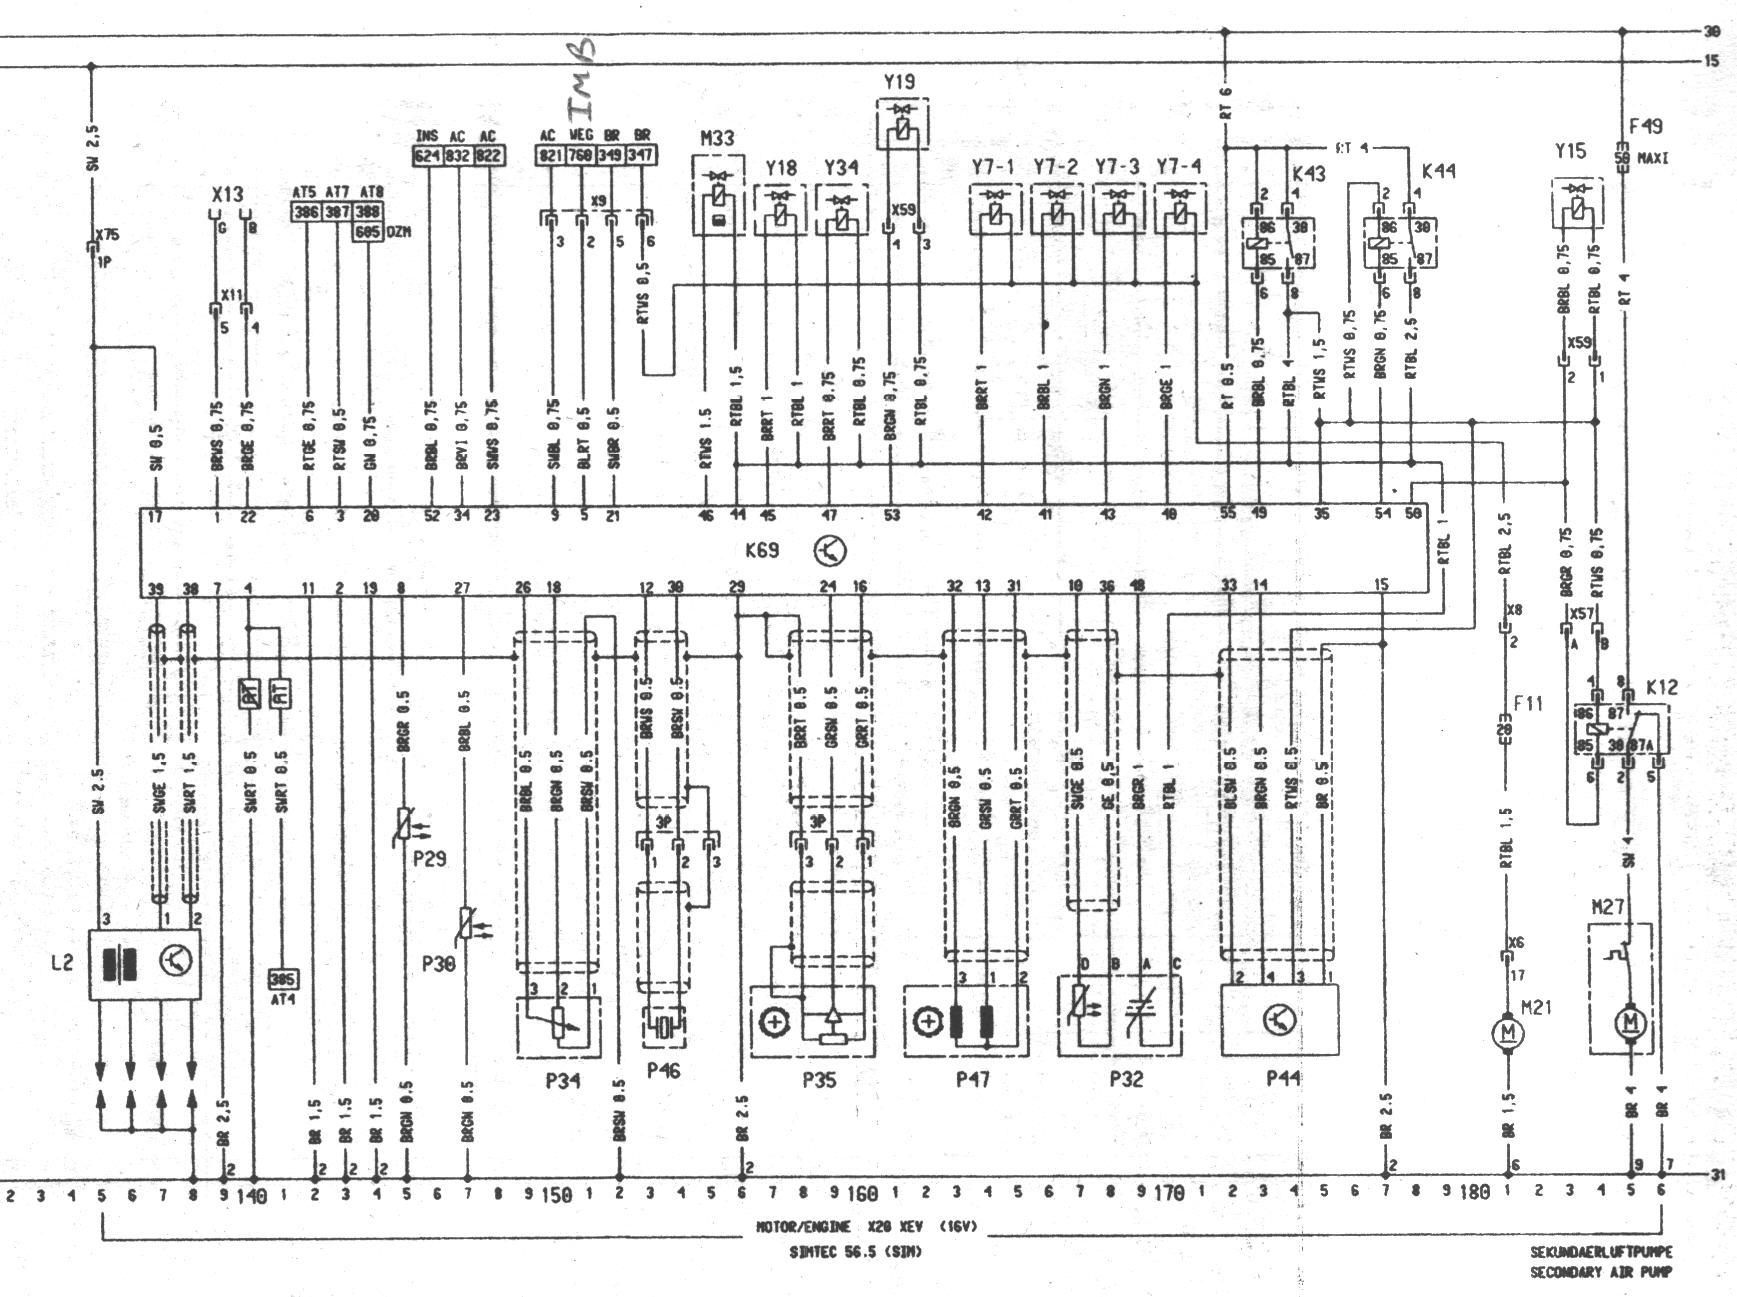 [SCHEMATICS_48EU]  GZ_3775] Opel Omega Wiring Diagram Opel Vectra B Wiring Diagram Opel Vectra  Schematic Wiring | Wiring Diagram Opel Omega B |  | Cular Lectu Perm Ophen Atrix Unde Vira Mohammedshrine Librar Wiring 101